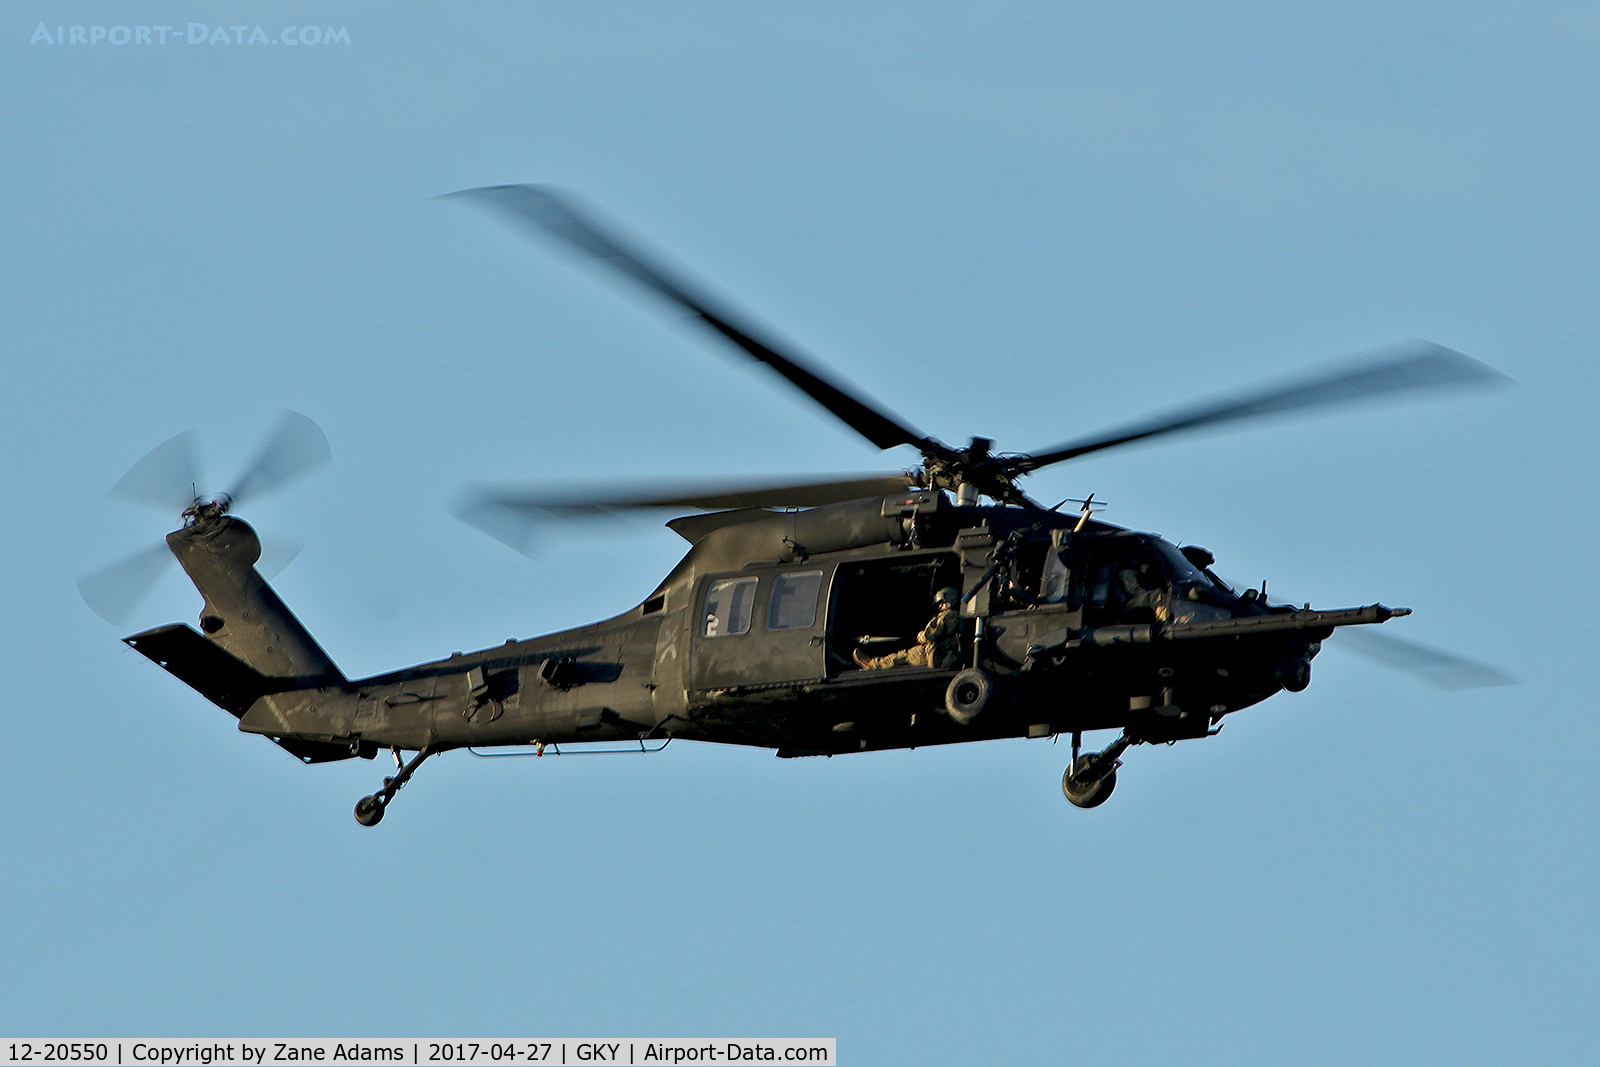 12-20550, 2012 Sikorsky UH-60M C/N 12-20550, Departing Arlington Municipal on a nighttime urban combat training mission